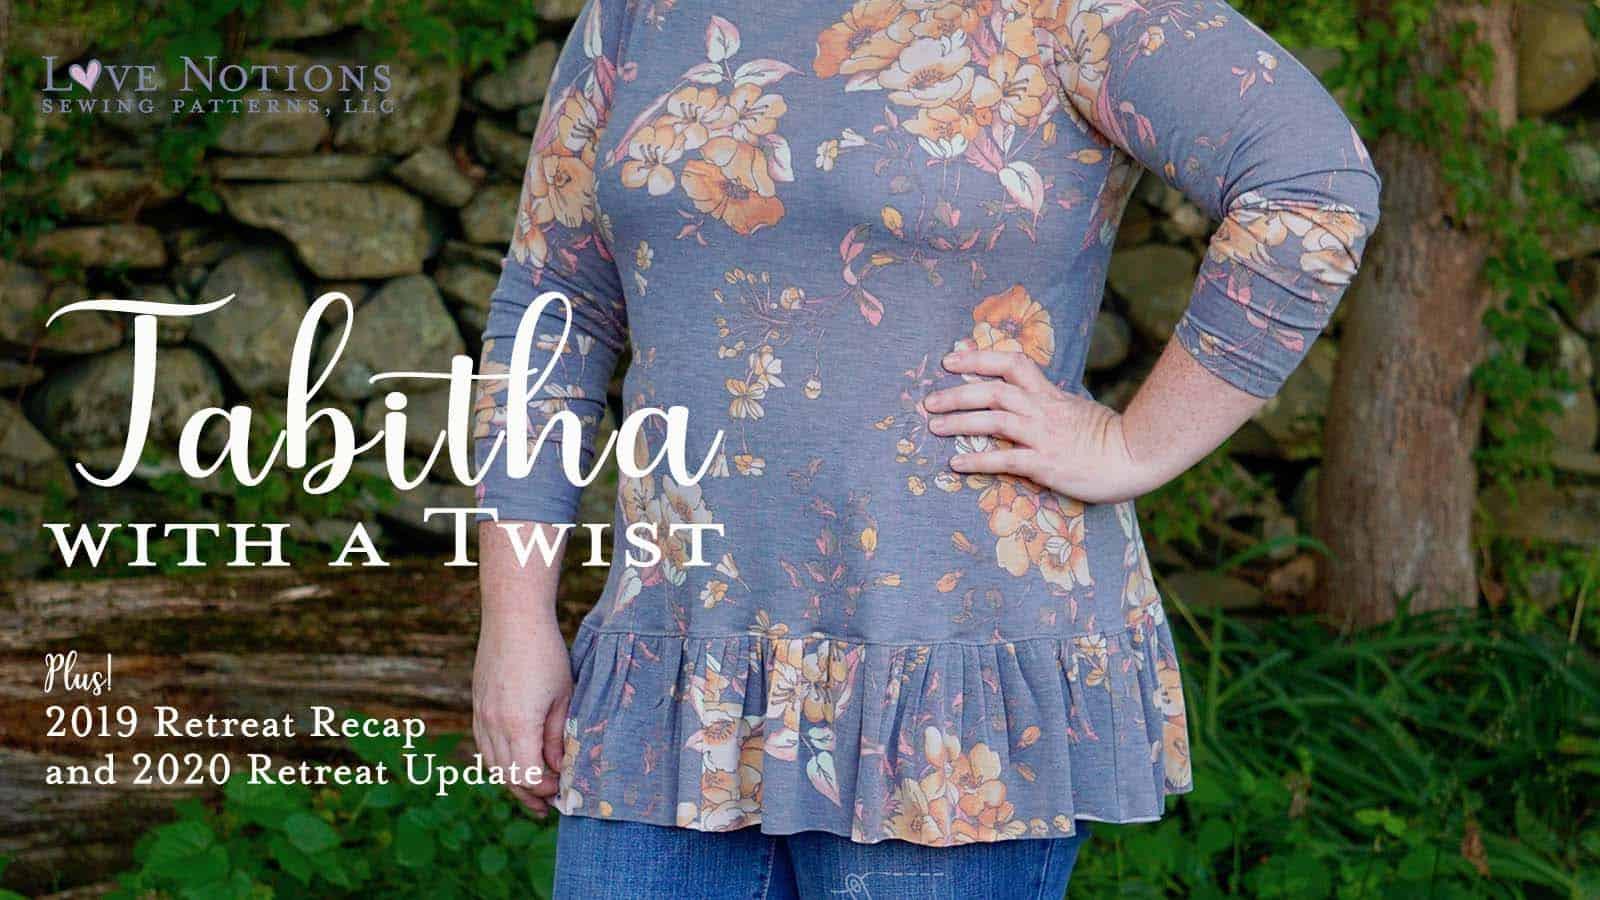 Tabitha